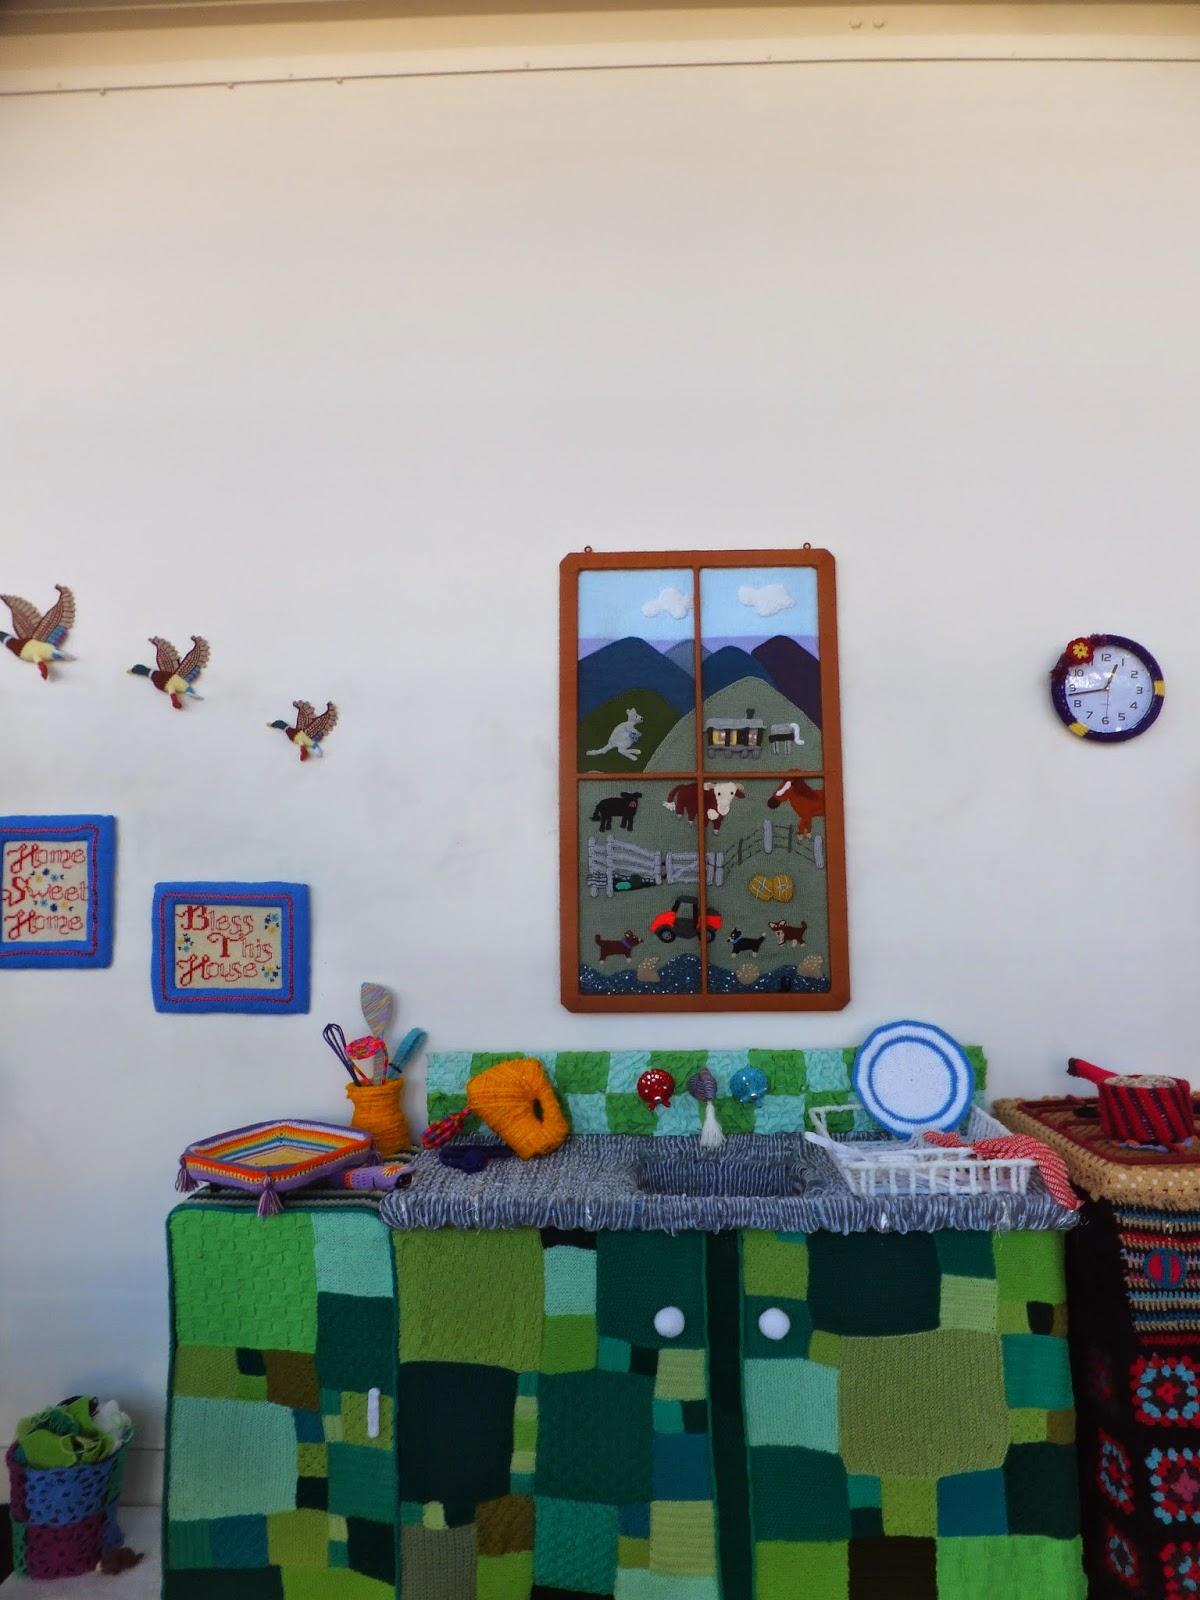 yarn-bombing-warwick-art-gallery-05